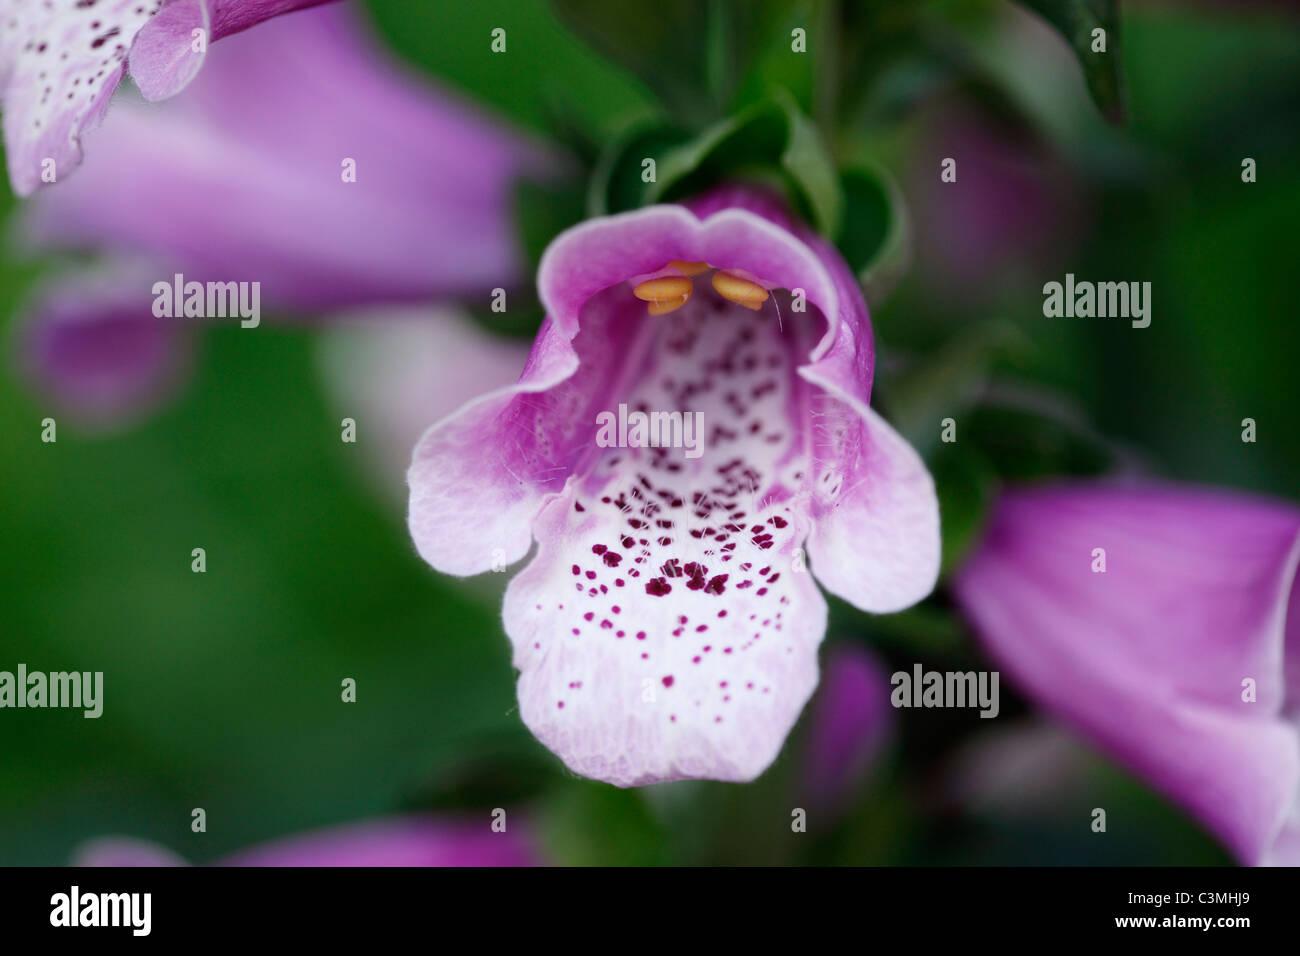 Germany, Bavaria, Purple foxglove, close up - Stock Image